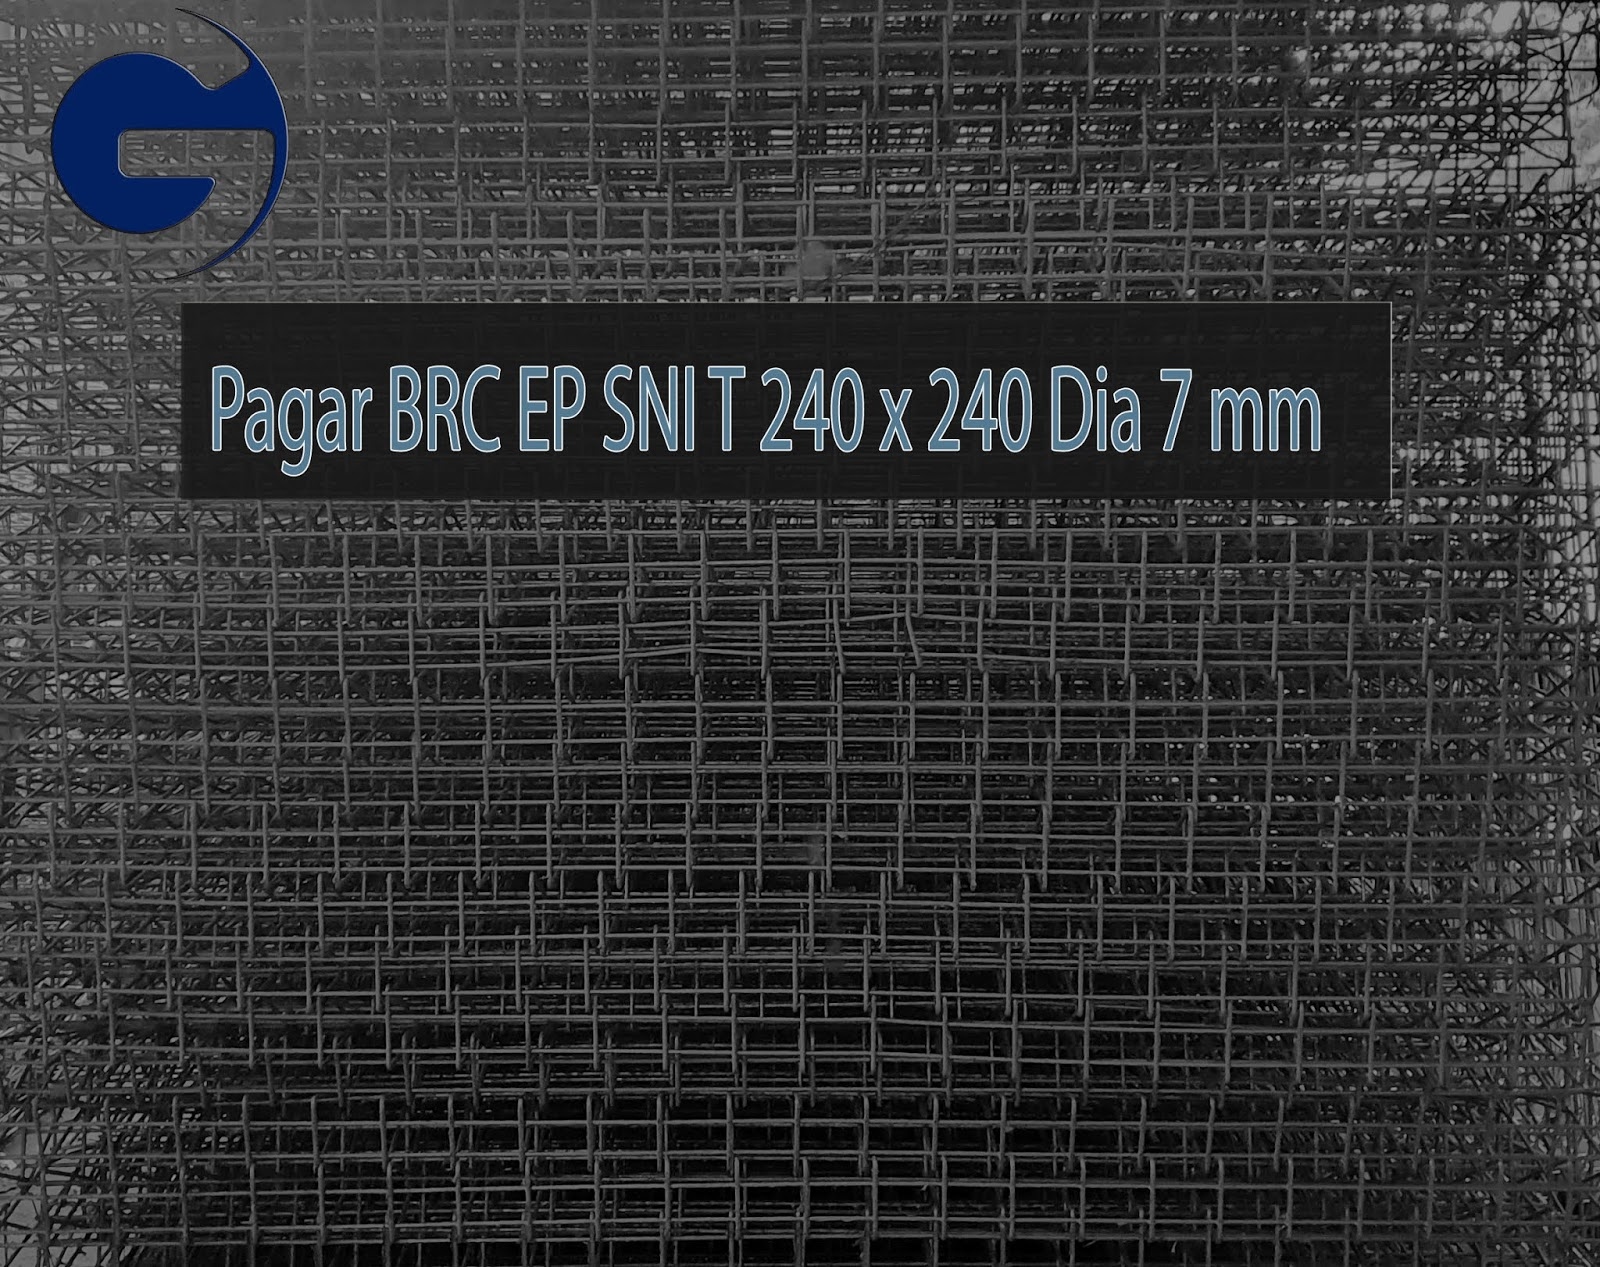 Jual Pagar BRC EP SNI T 240 x 240 Dia 7 mm